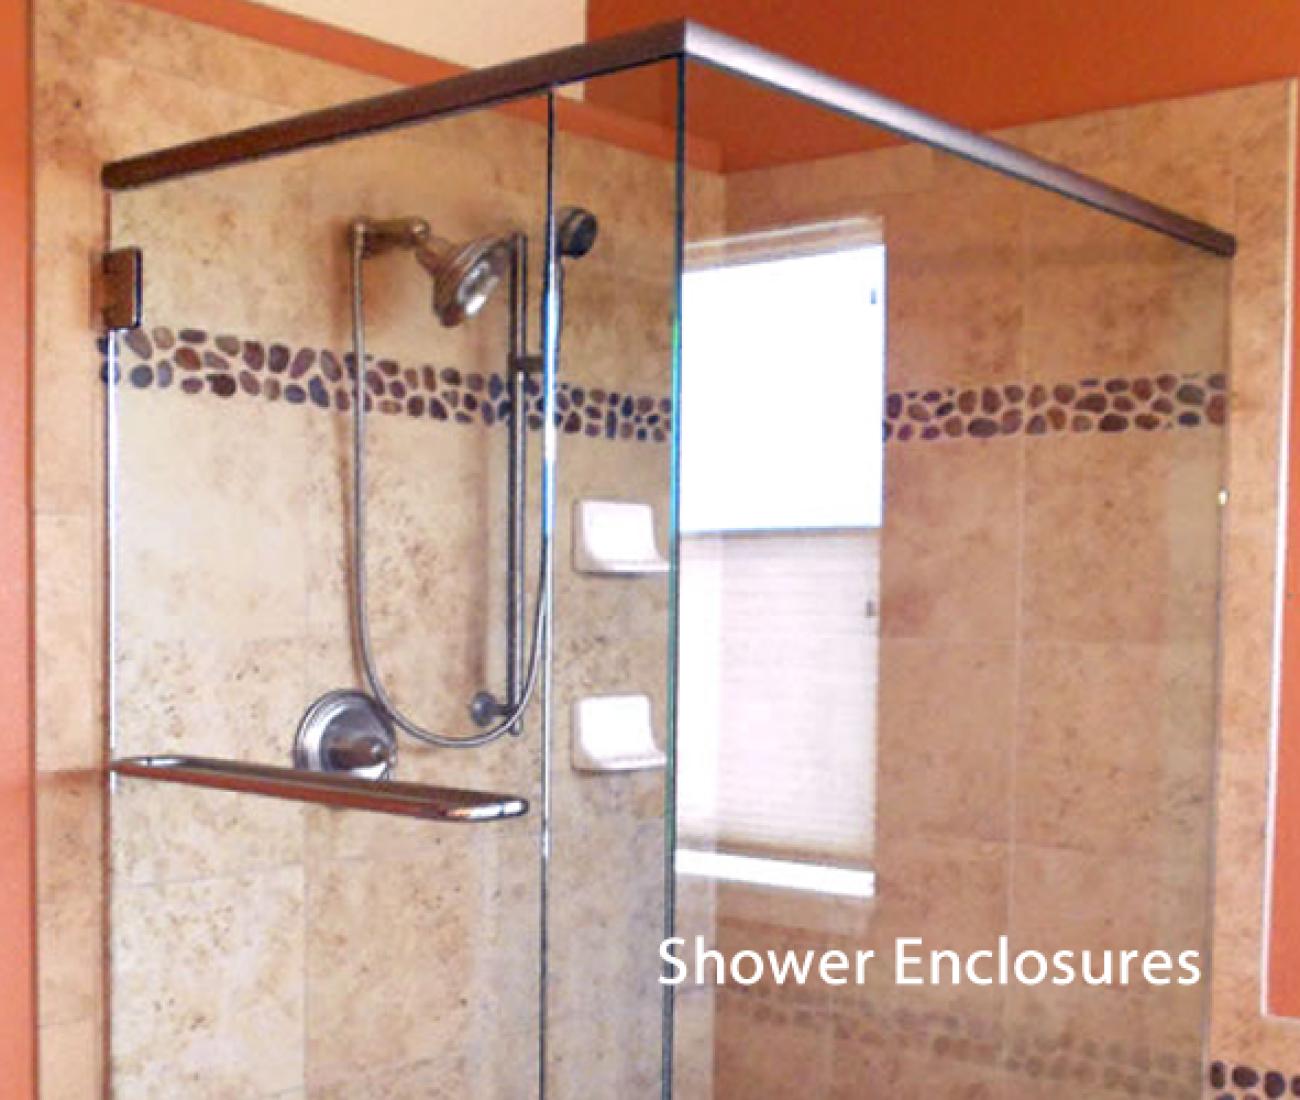 showerenclosures-1300x1100.jpg